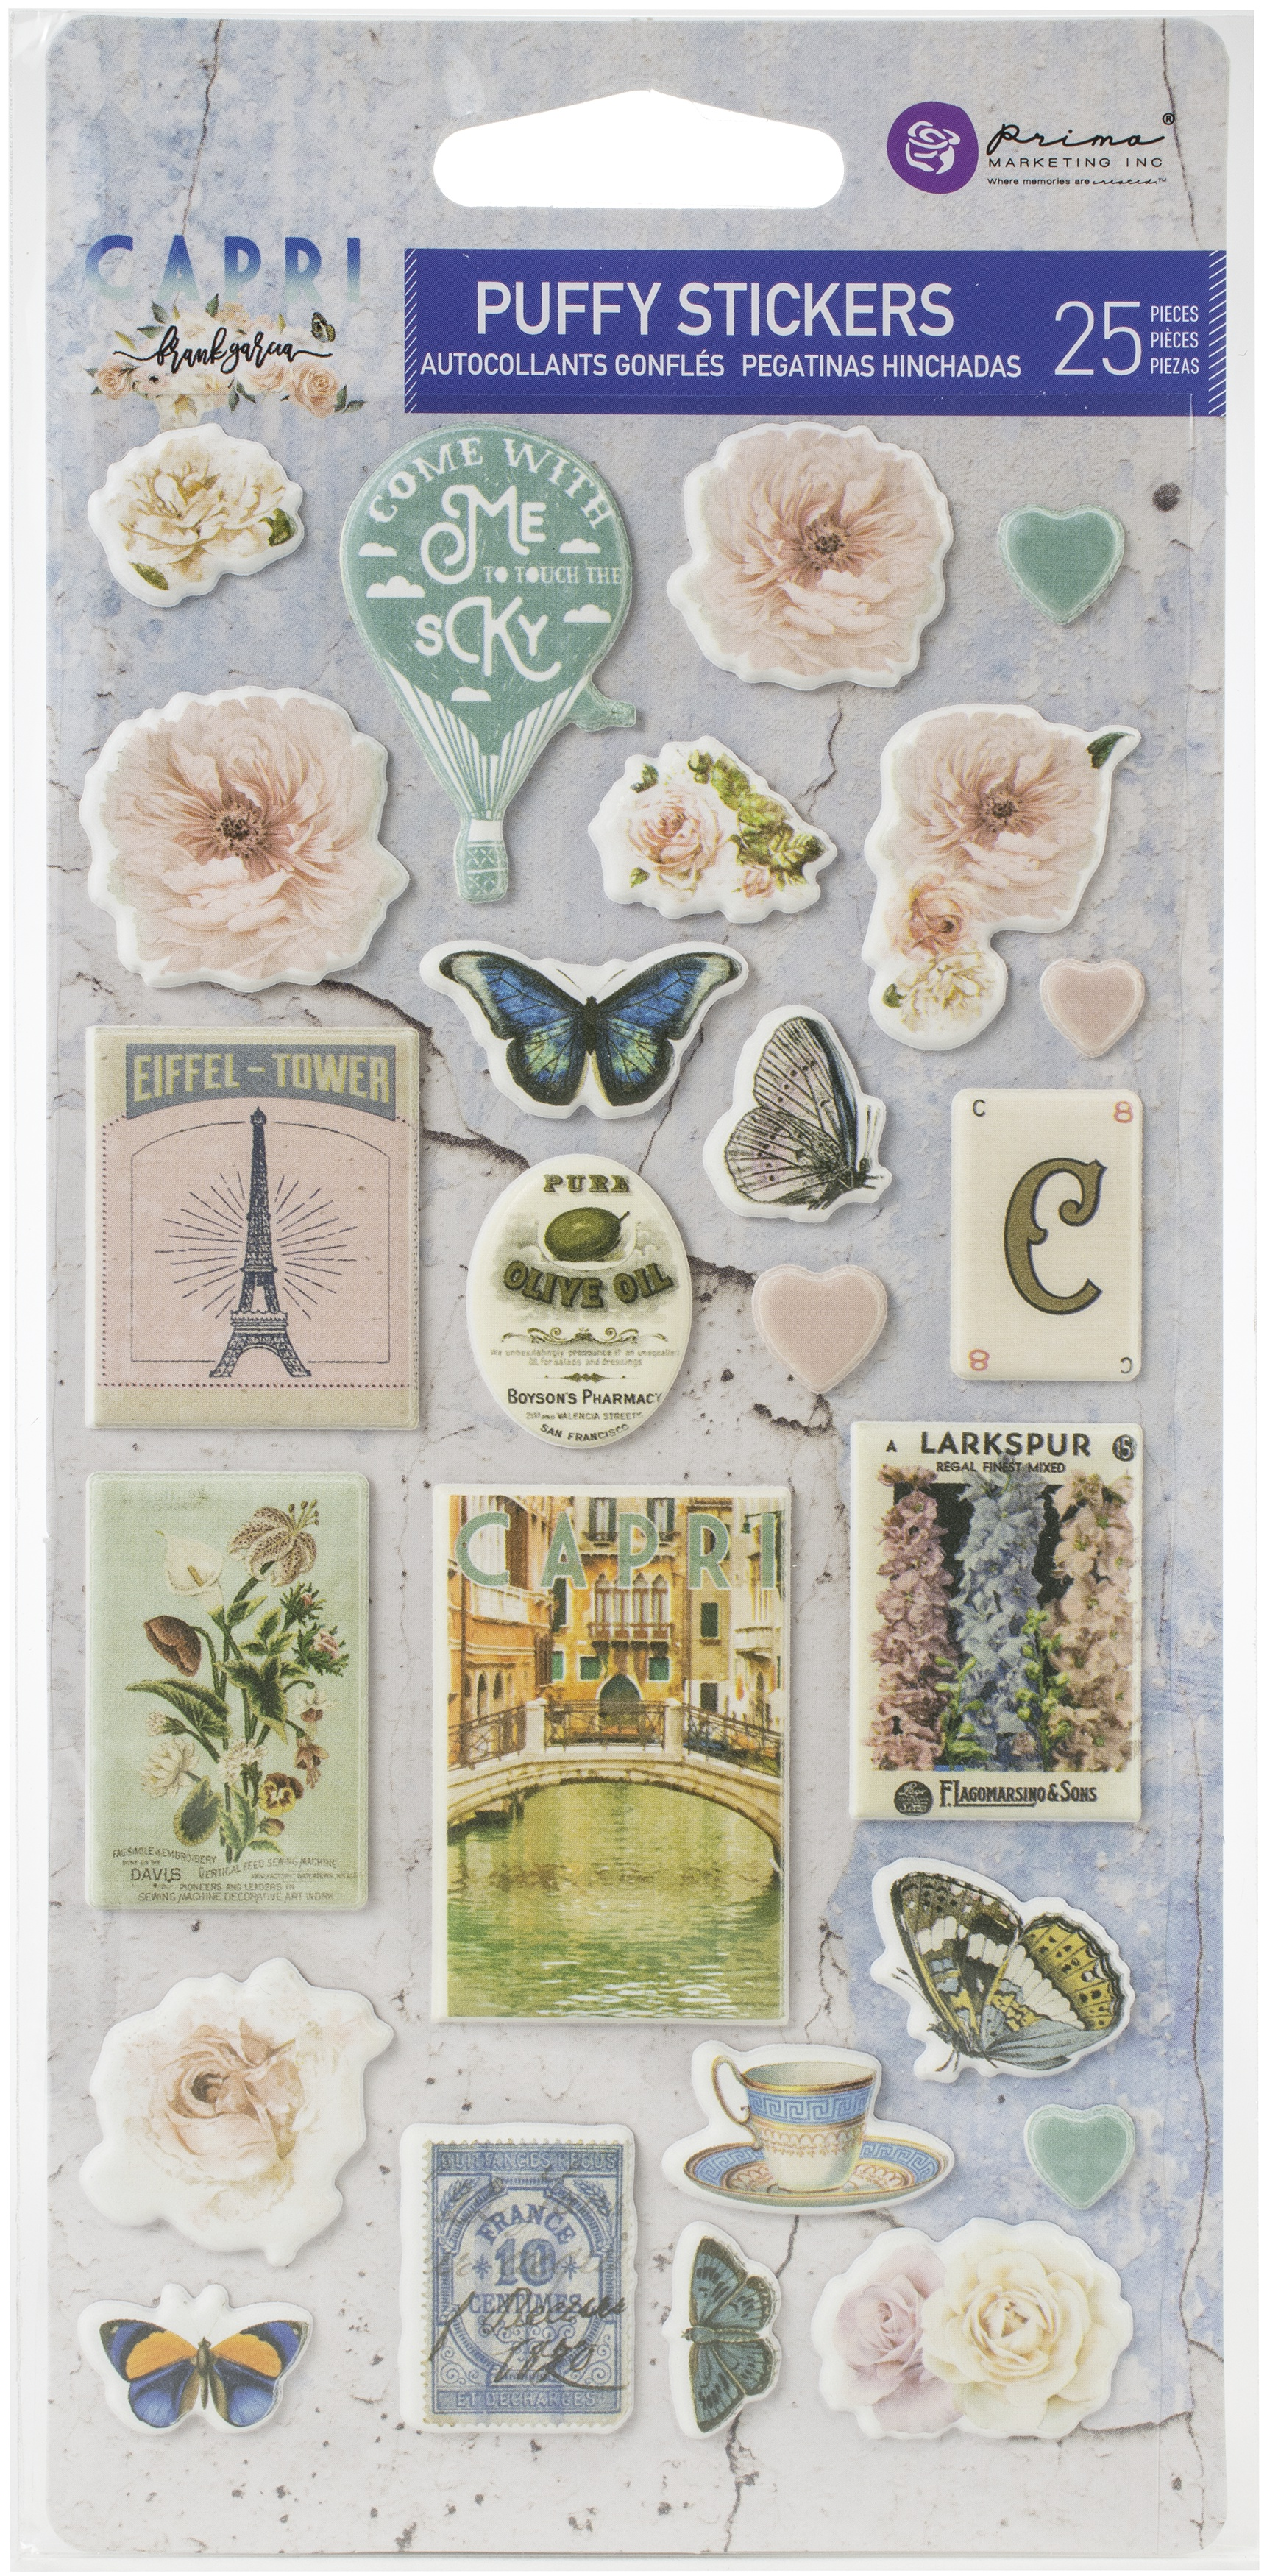 Capri Puffy Stickers 25/Pkg-